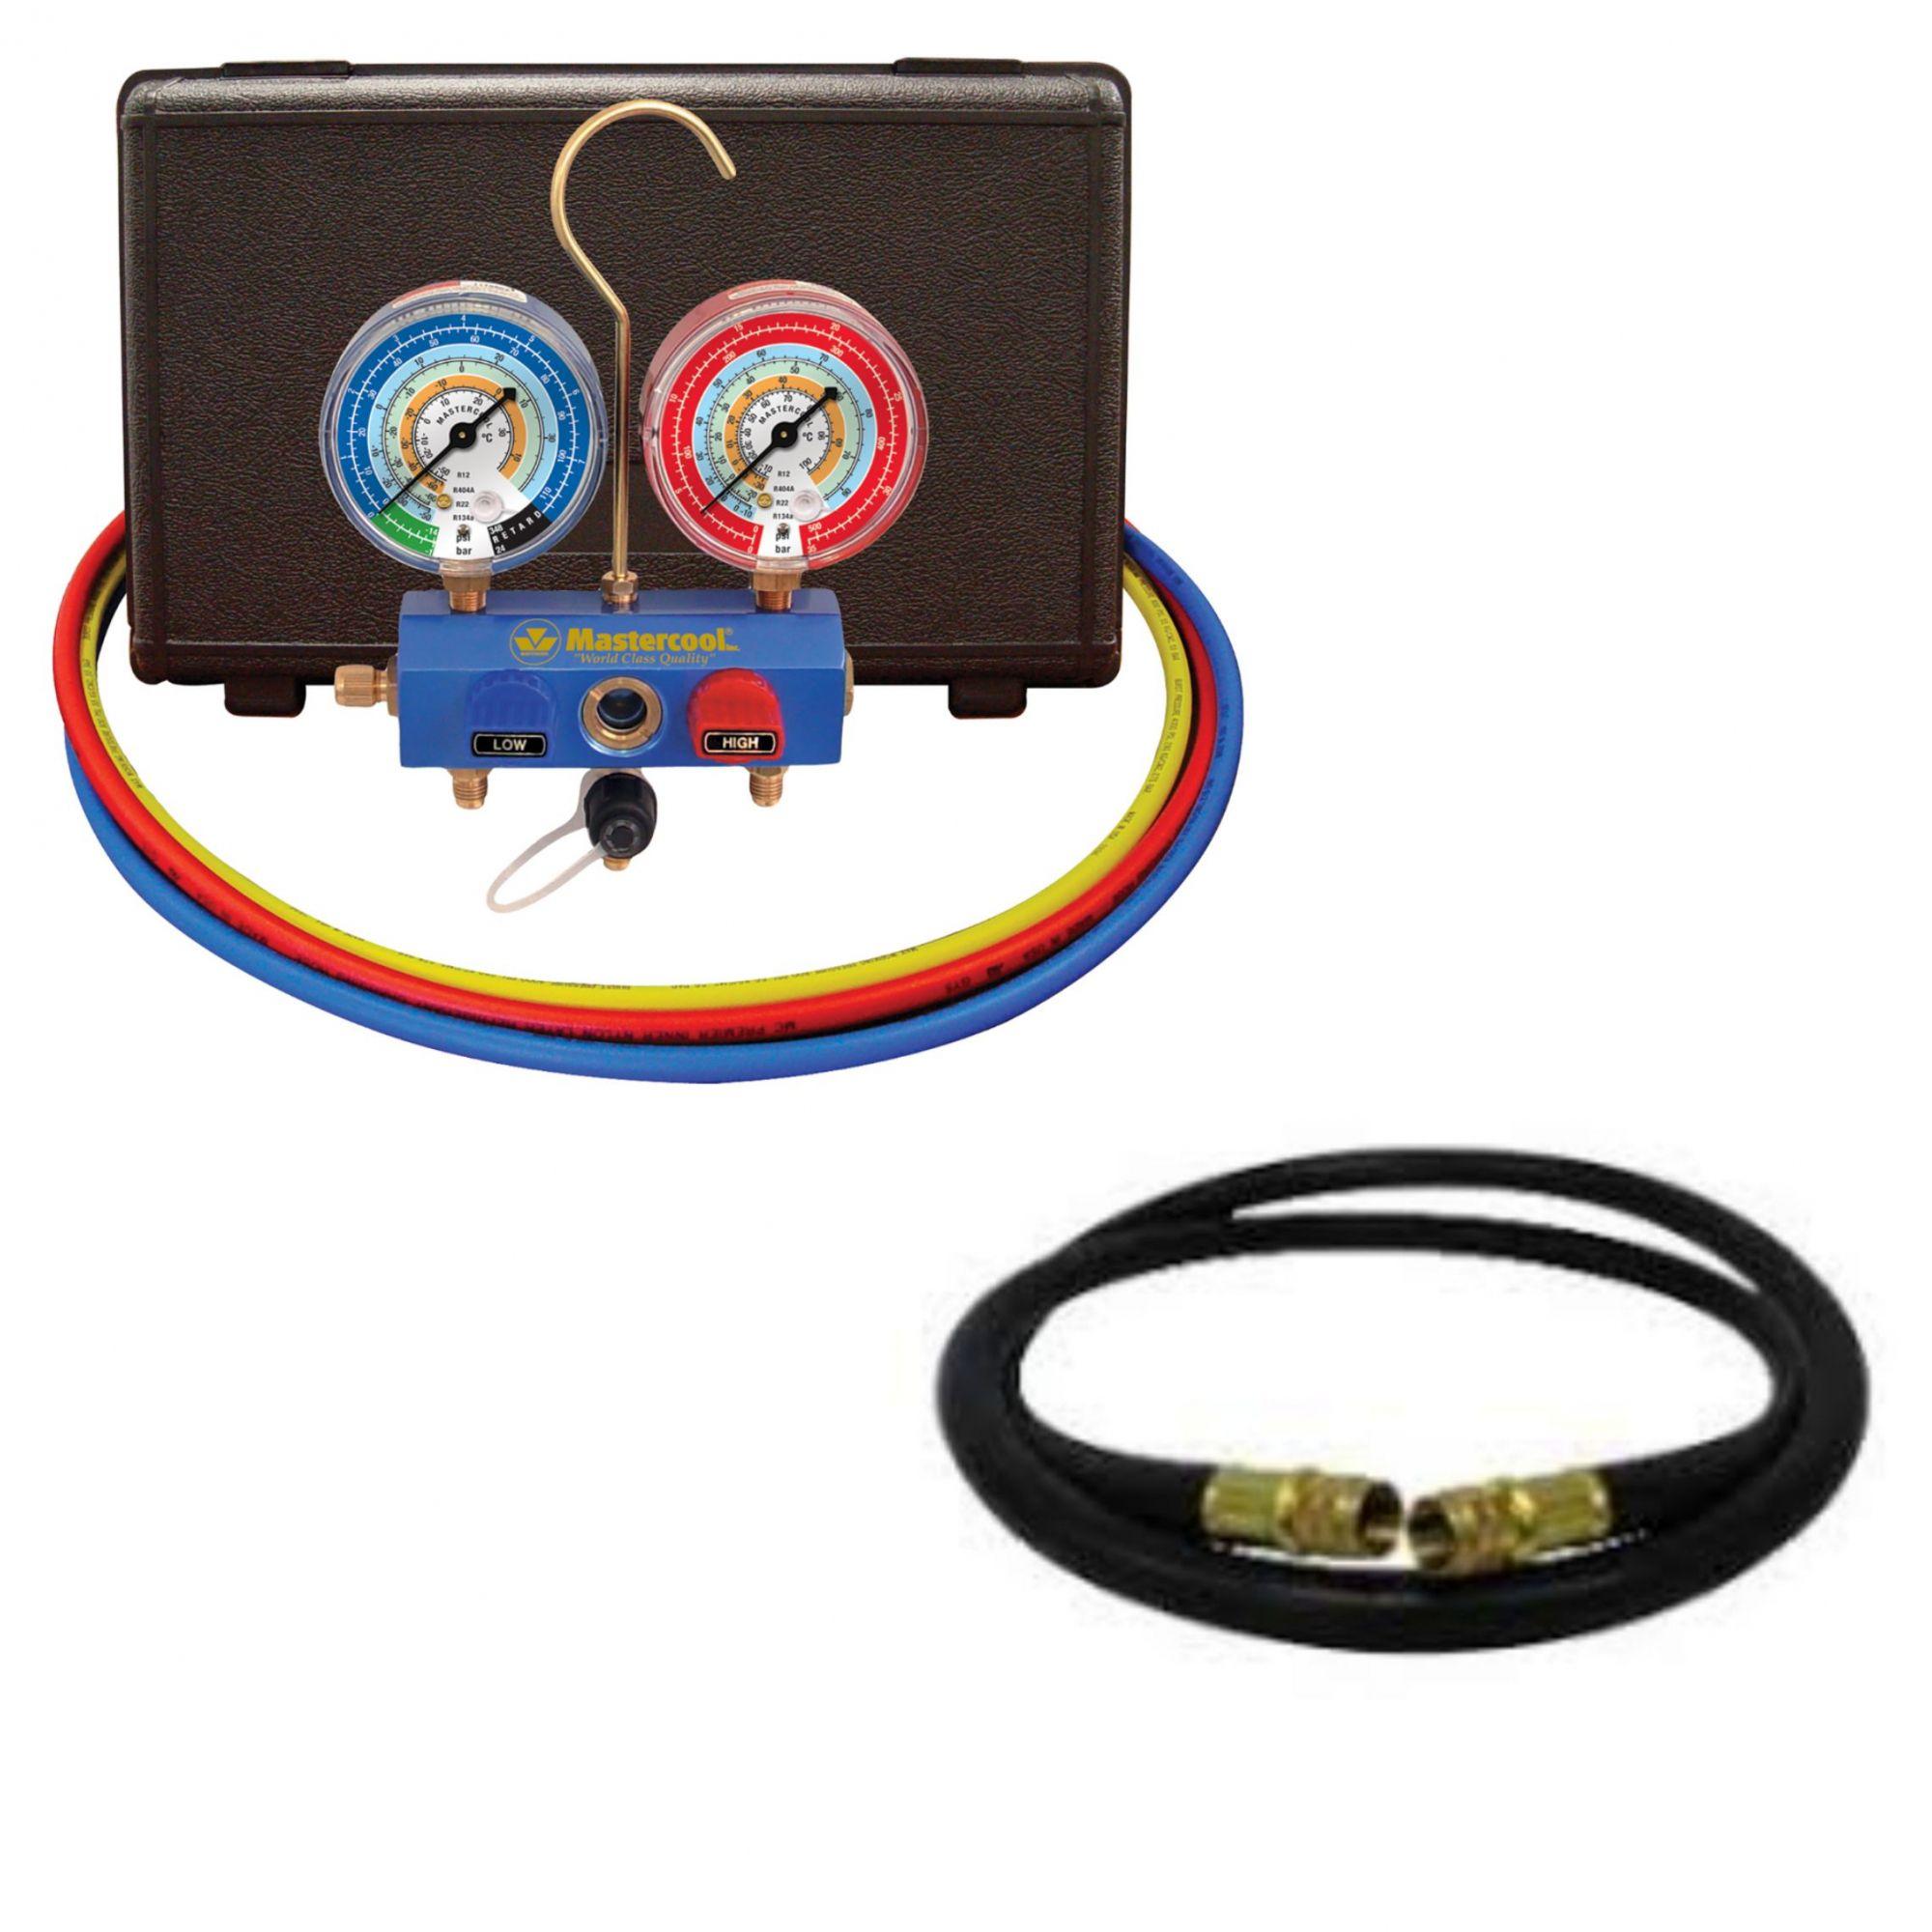 Kit Manifold Premium 57261-ejt r410 + Mangueira de vácuo 94172 Mastercool